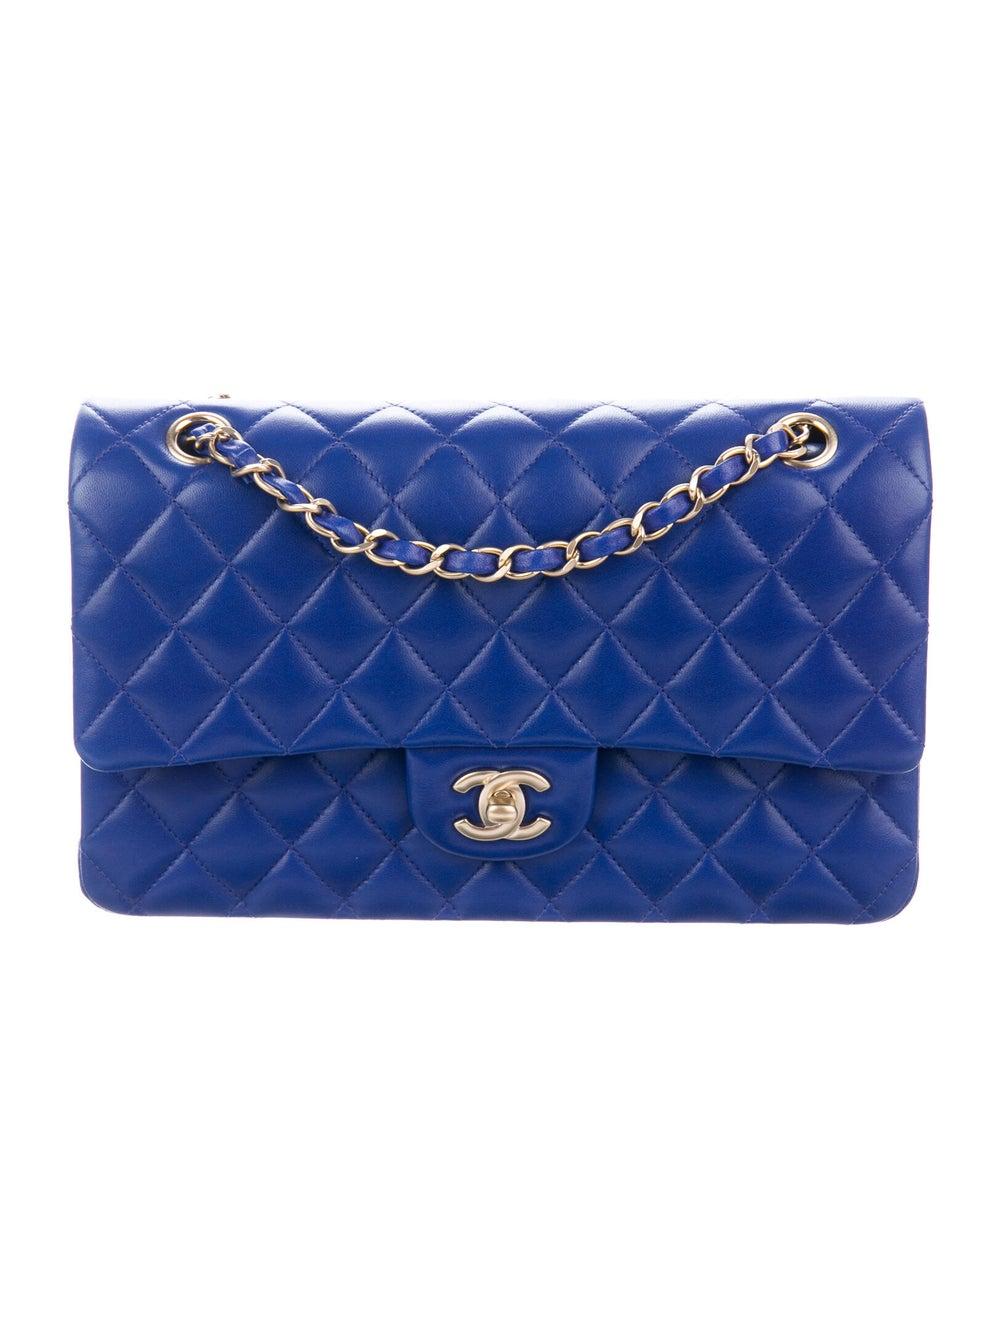 Chanel Medium Classic Double Flap Bag Blue - image 1